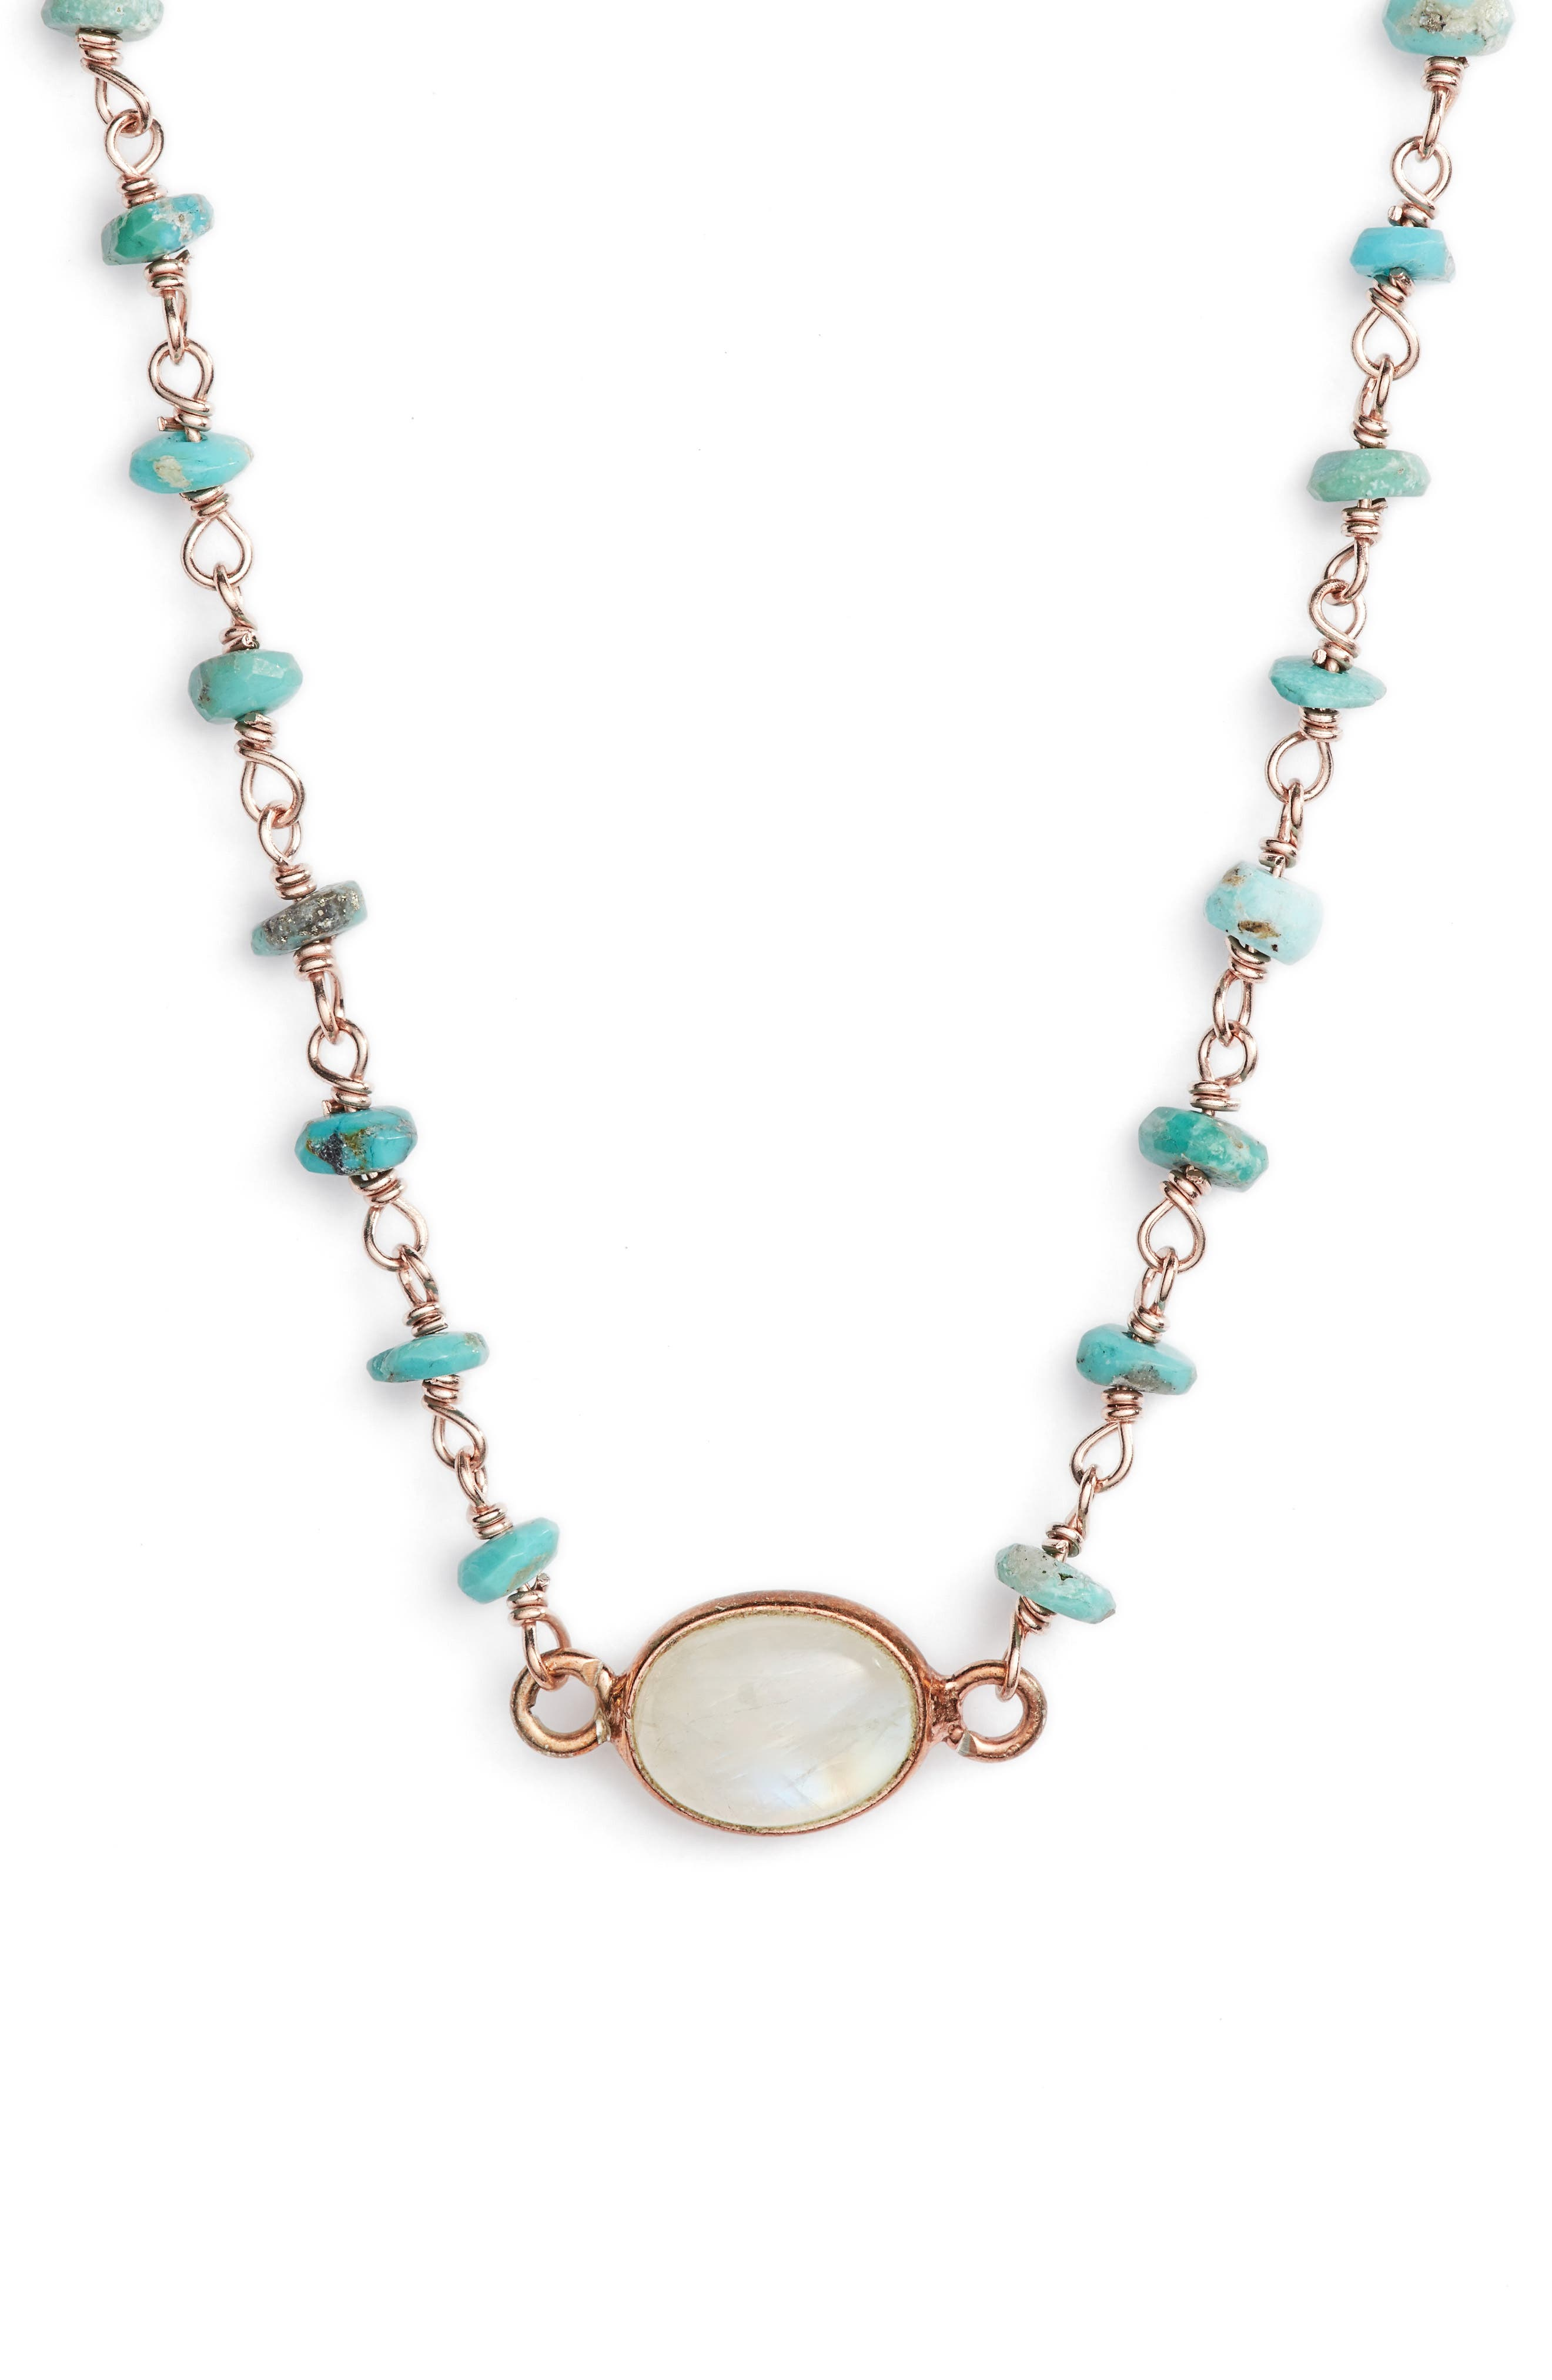 Semiprecious Stone Collar Necklace,                         Main,                         color, Turquoise/ Moonstone